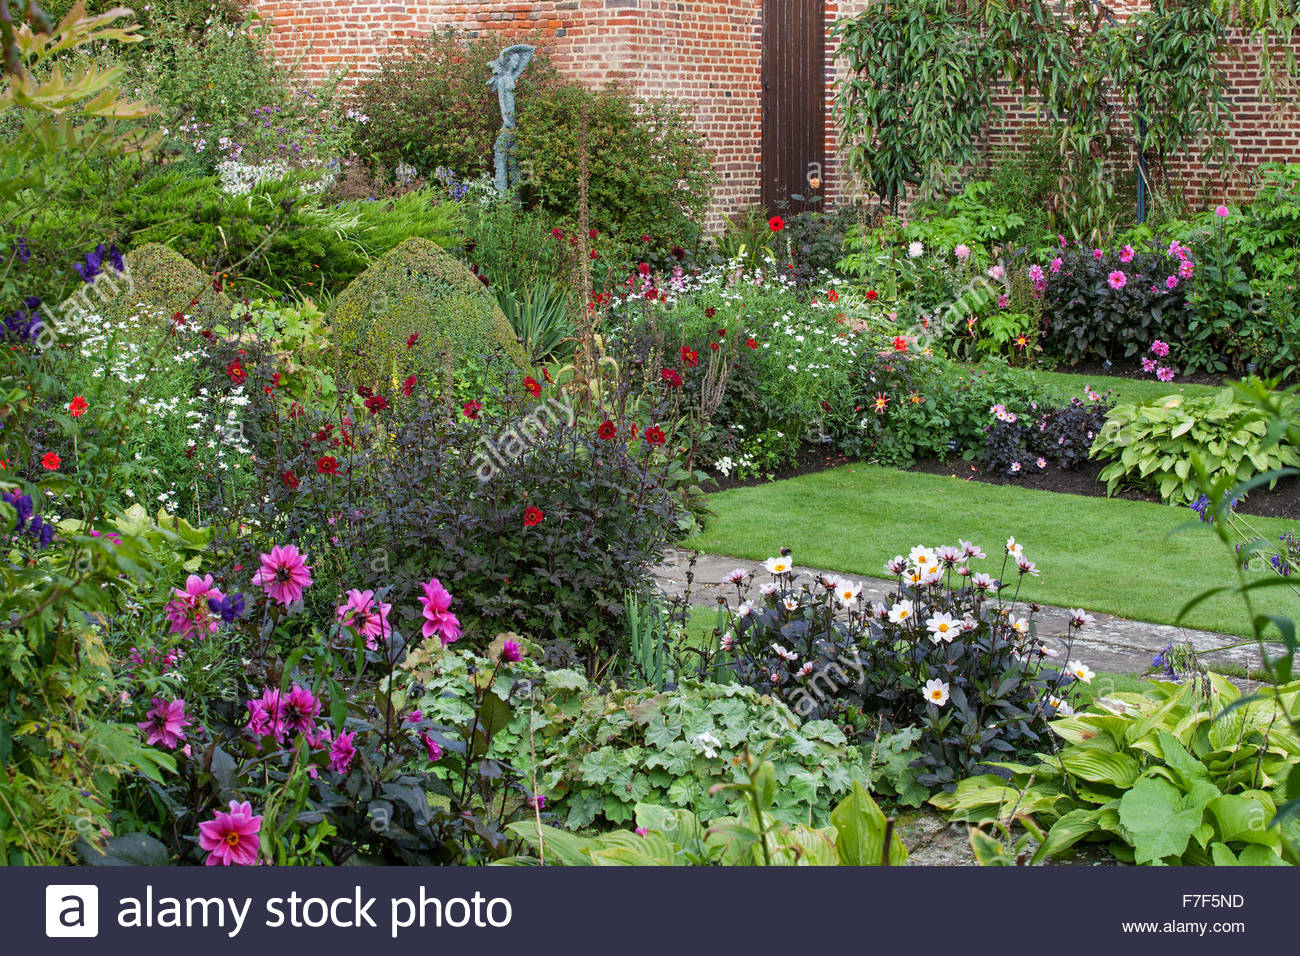 Chenies Manor Gardens - English Garden showing the summer sunken Garden double borders with Dahlia and perennials - Stock Image